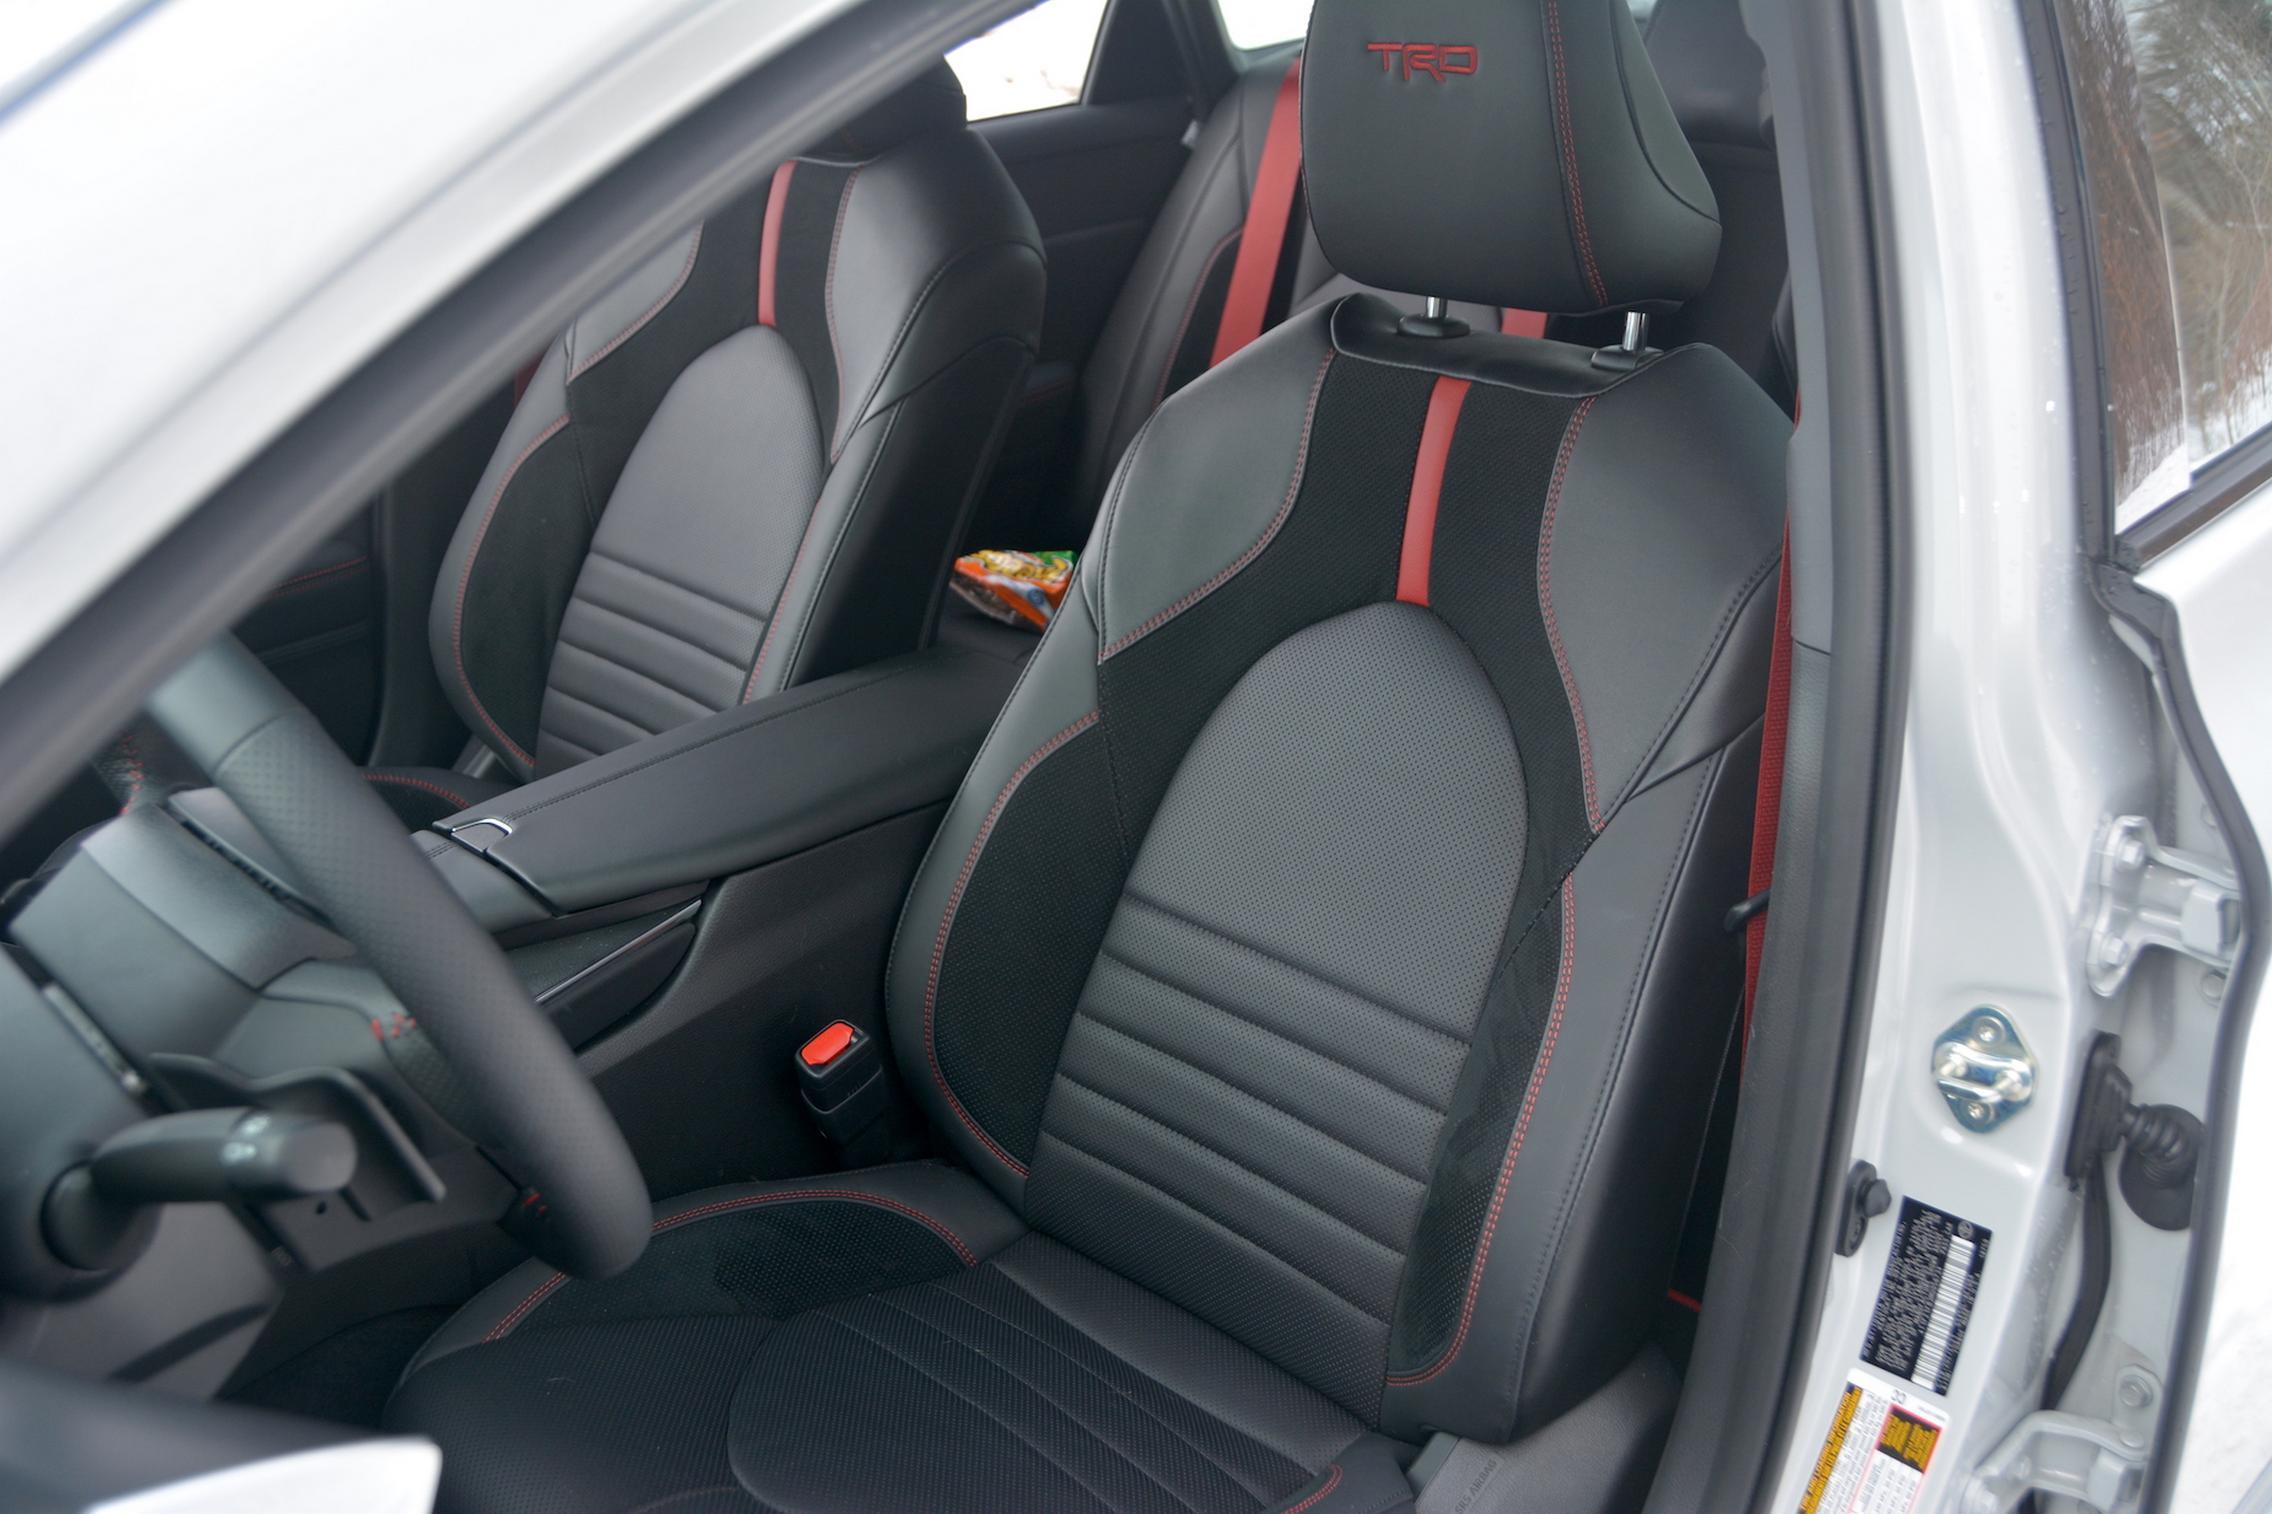 Toyota Avalon TRD cabin